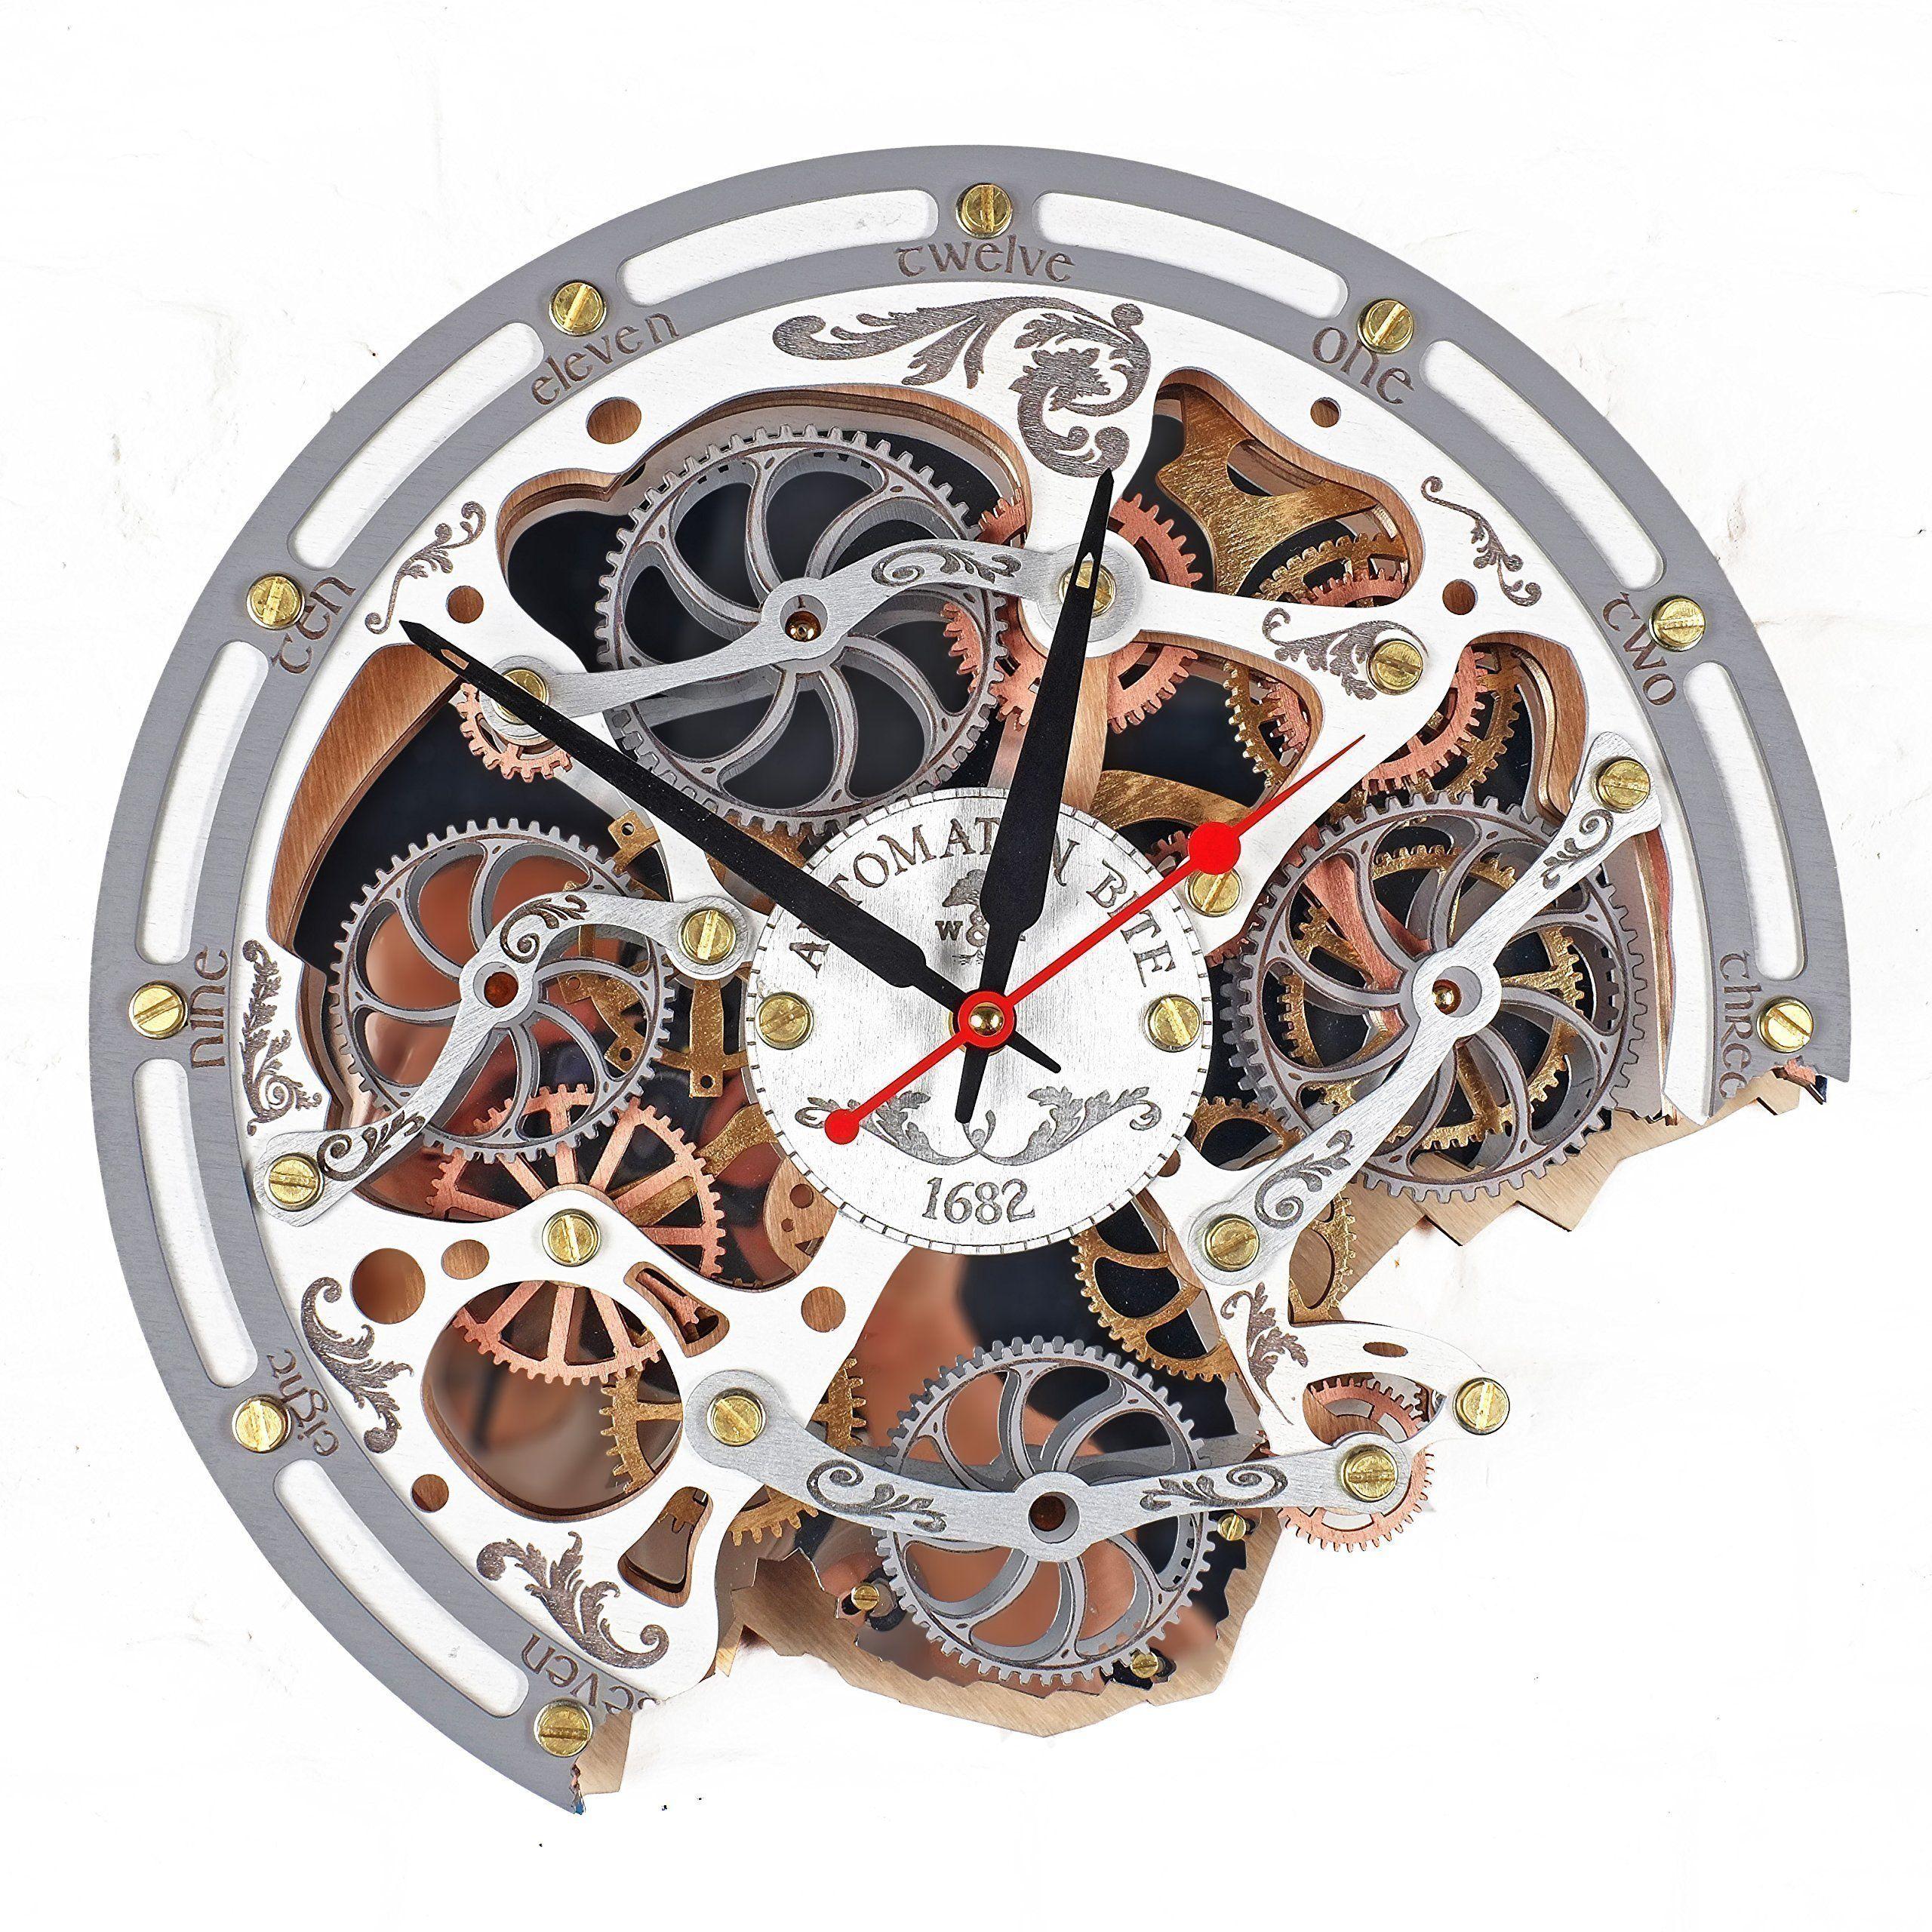 Automaton Moving Gear Wall Clock 1682 Gear Wall Clock Grey Wall Clocks White Wall Clocks